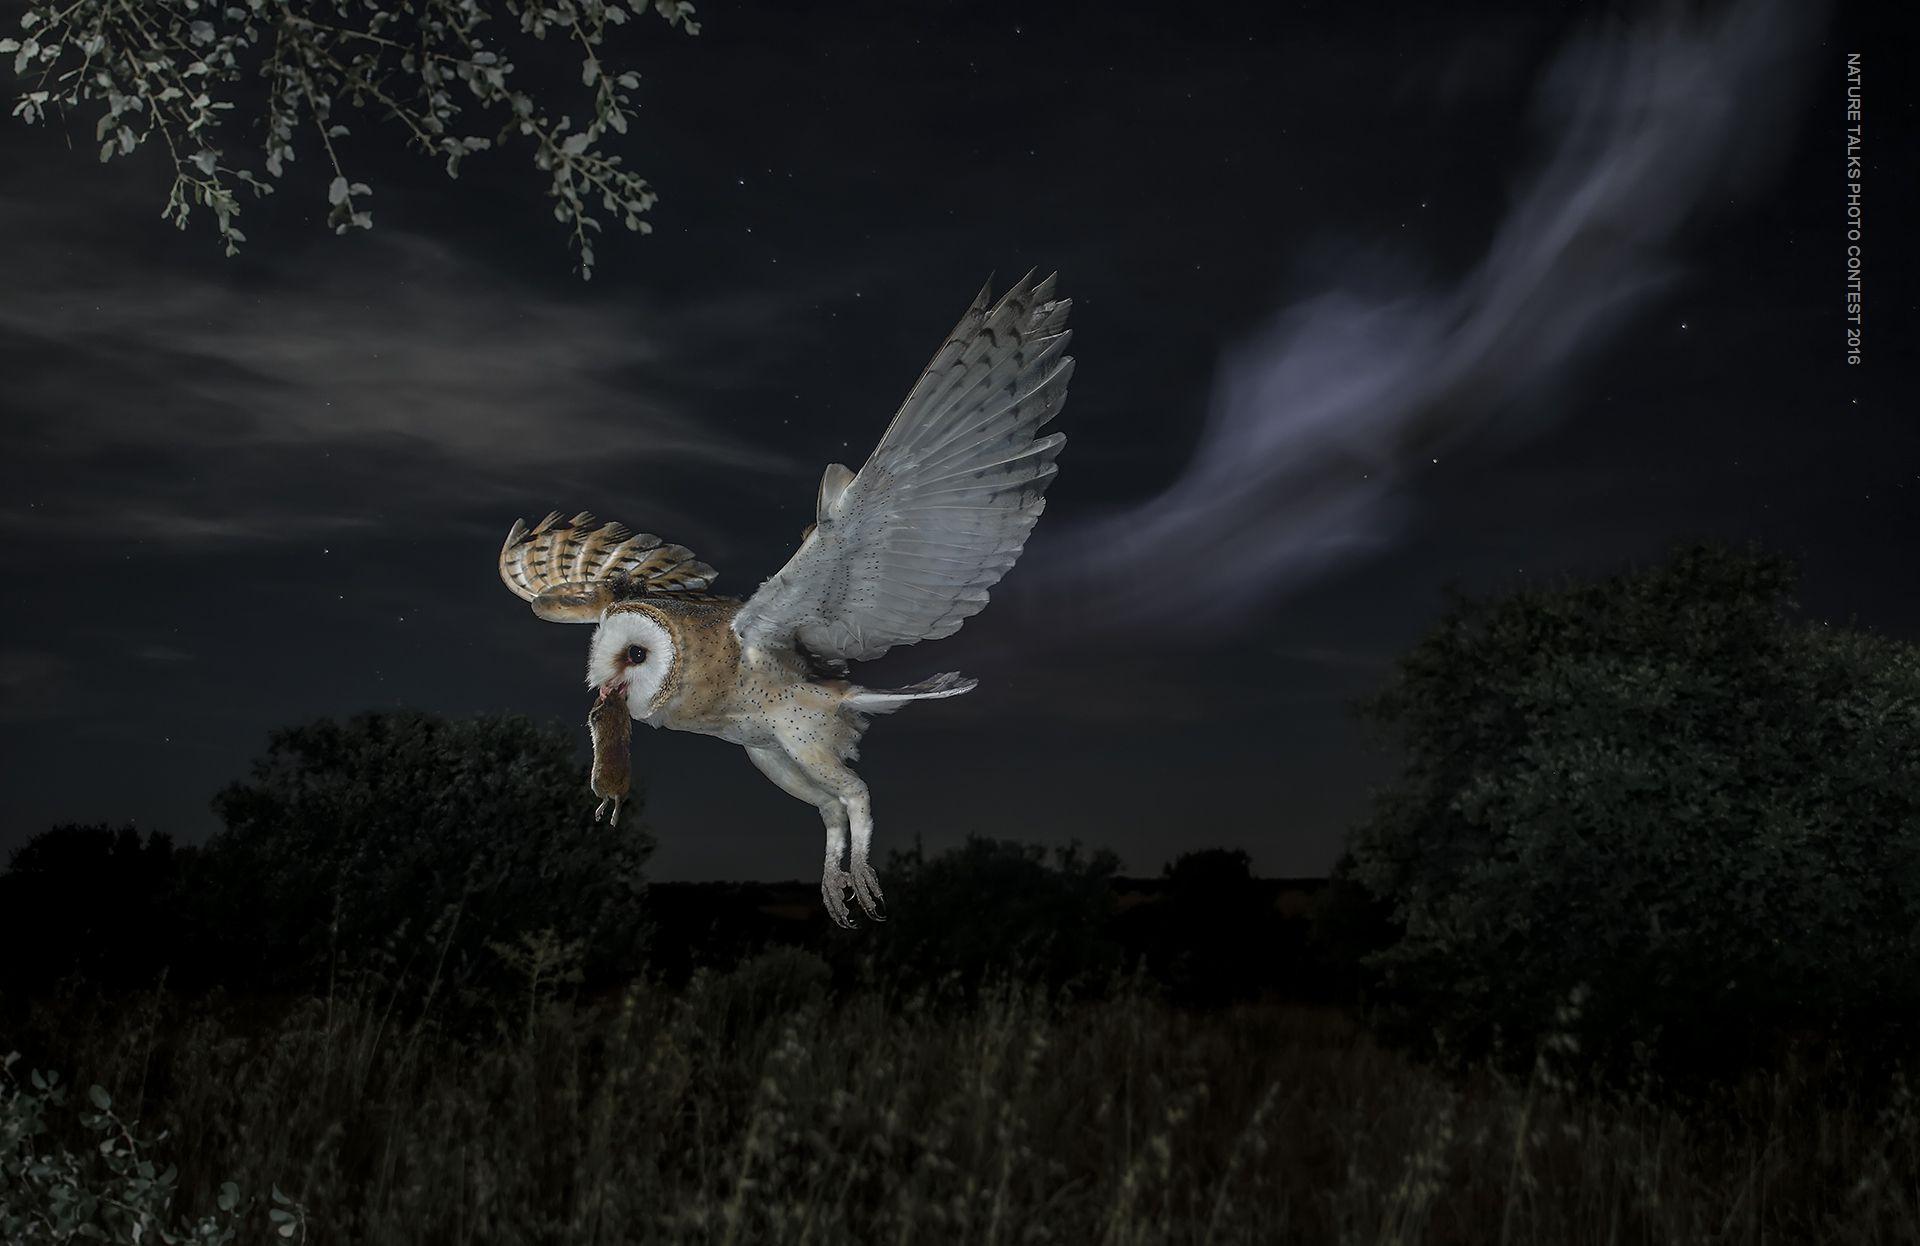 Nightly ghost